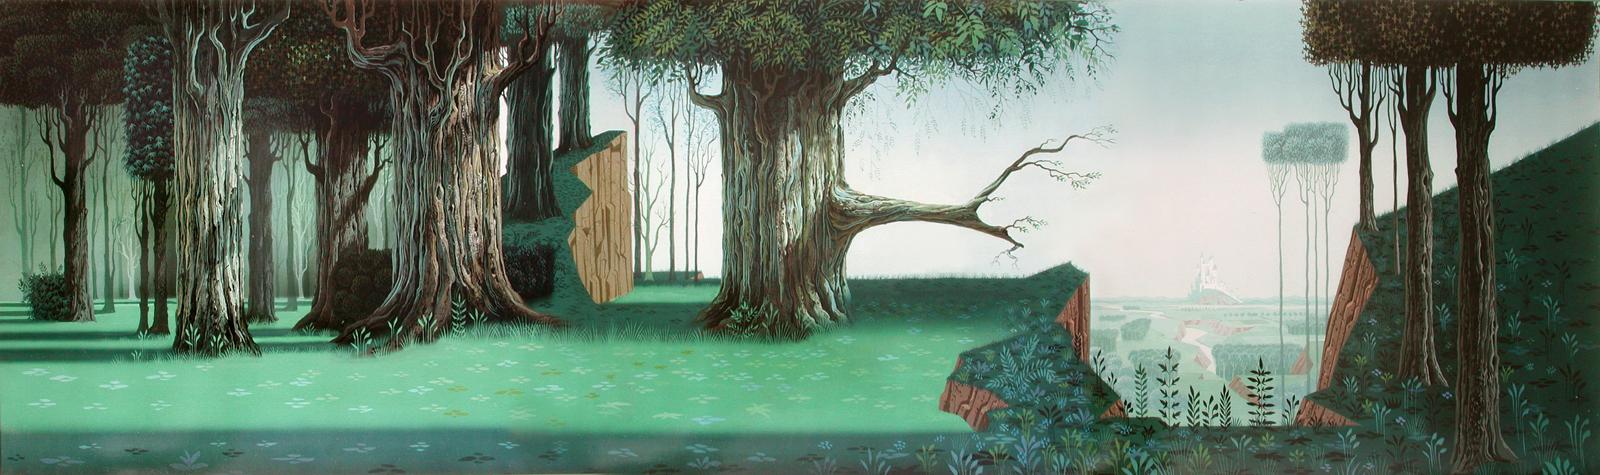 Eyvind Earle Art Gallery: Eyvind Early Sleeping Beauty Art ...